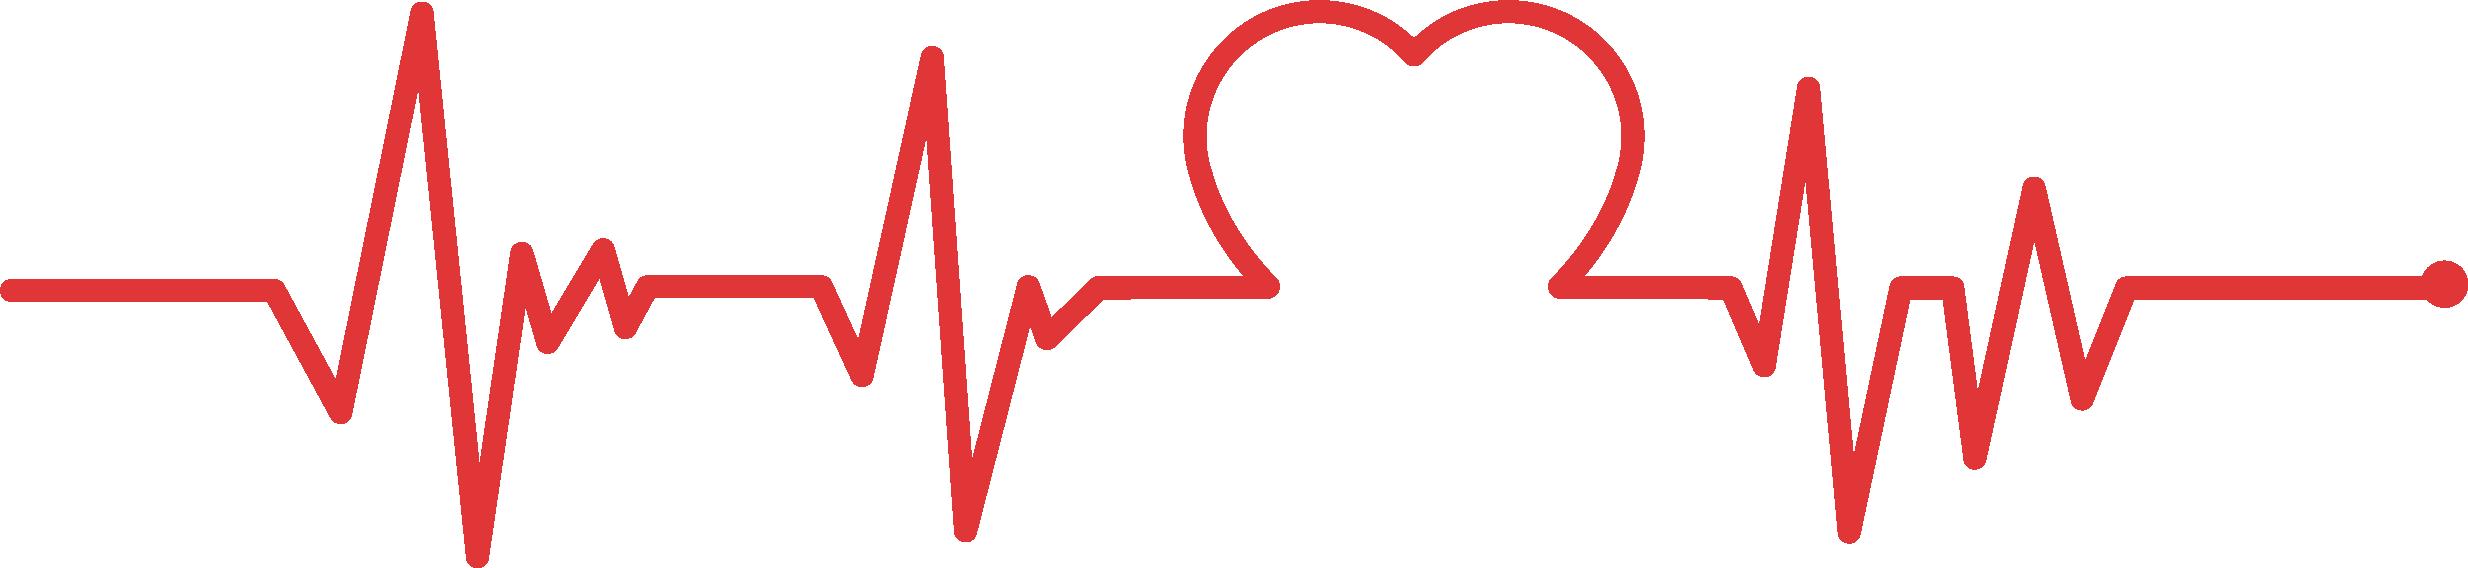 Ekg clipart heart monitor line, Ekg heart monitor line.